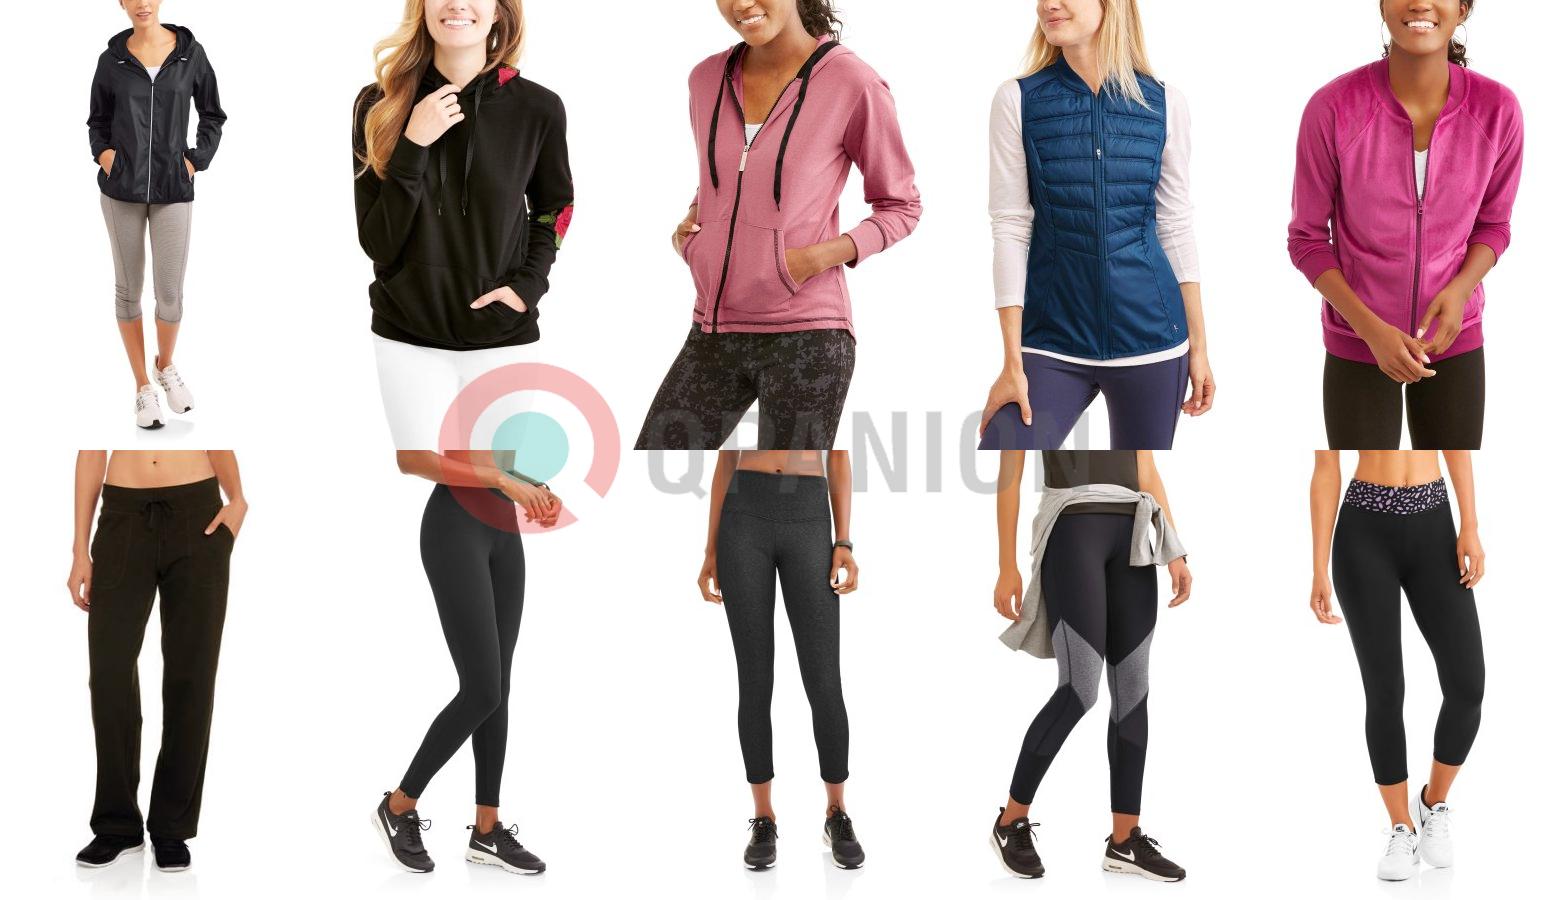 634fbc379f7  RUN  Walmart   2.50 Women s Activewear Clothing! Hoodies